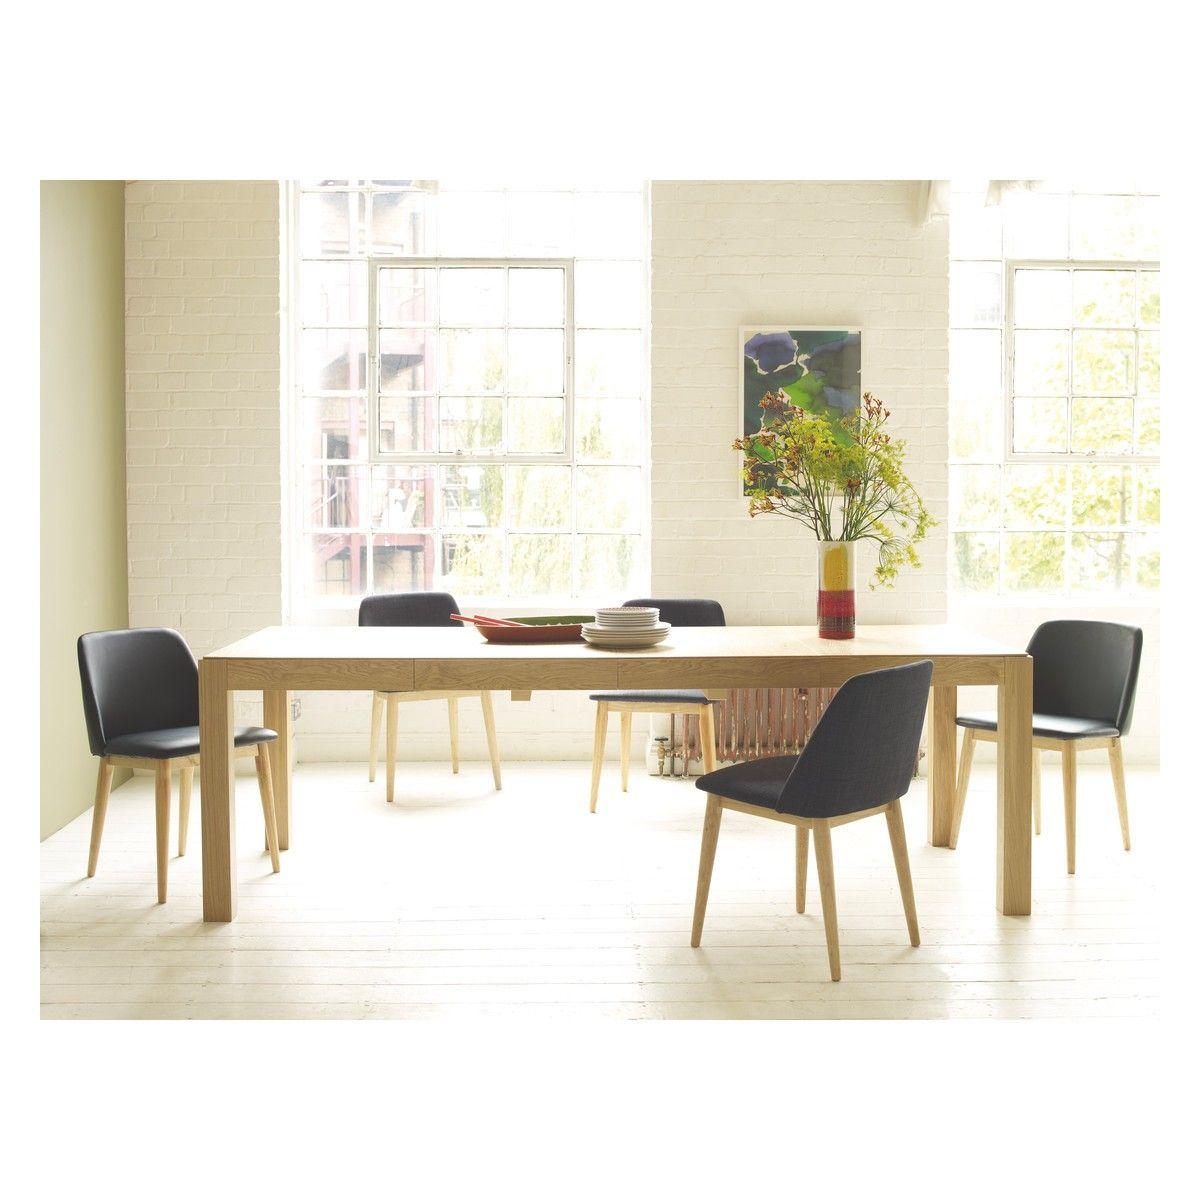 Drio 4 10 seat oak extending dining table